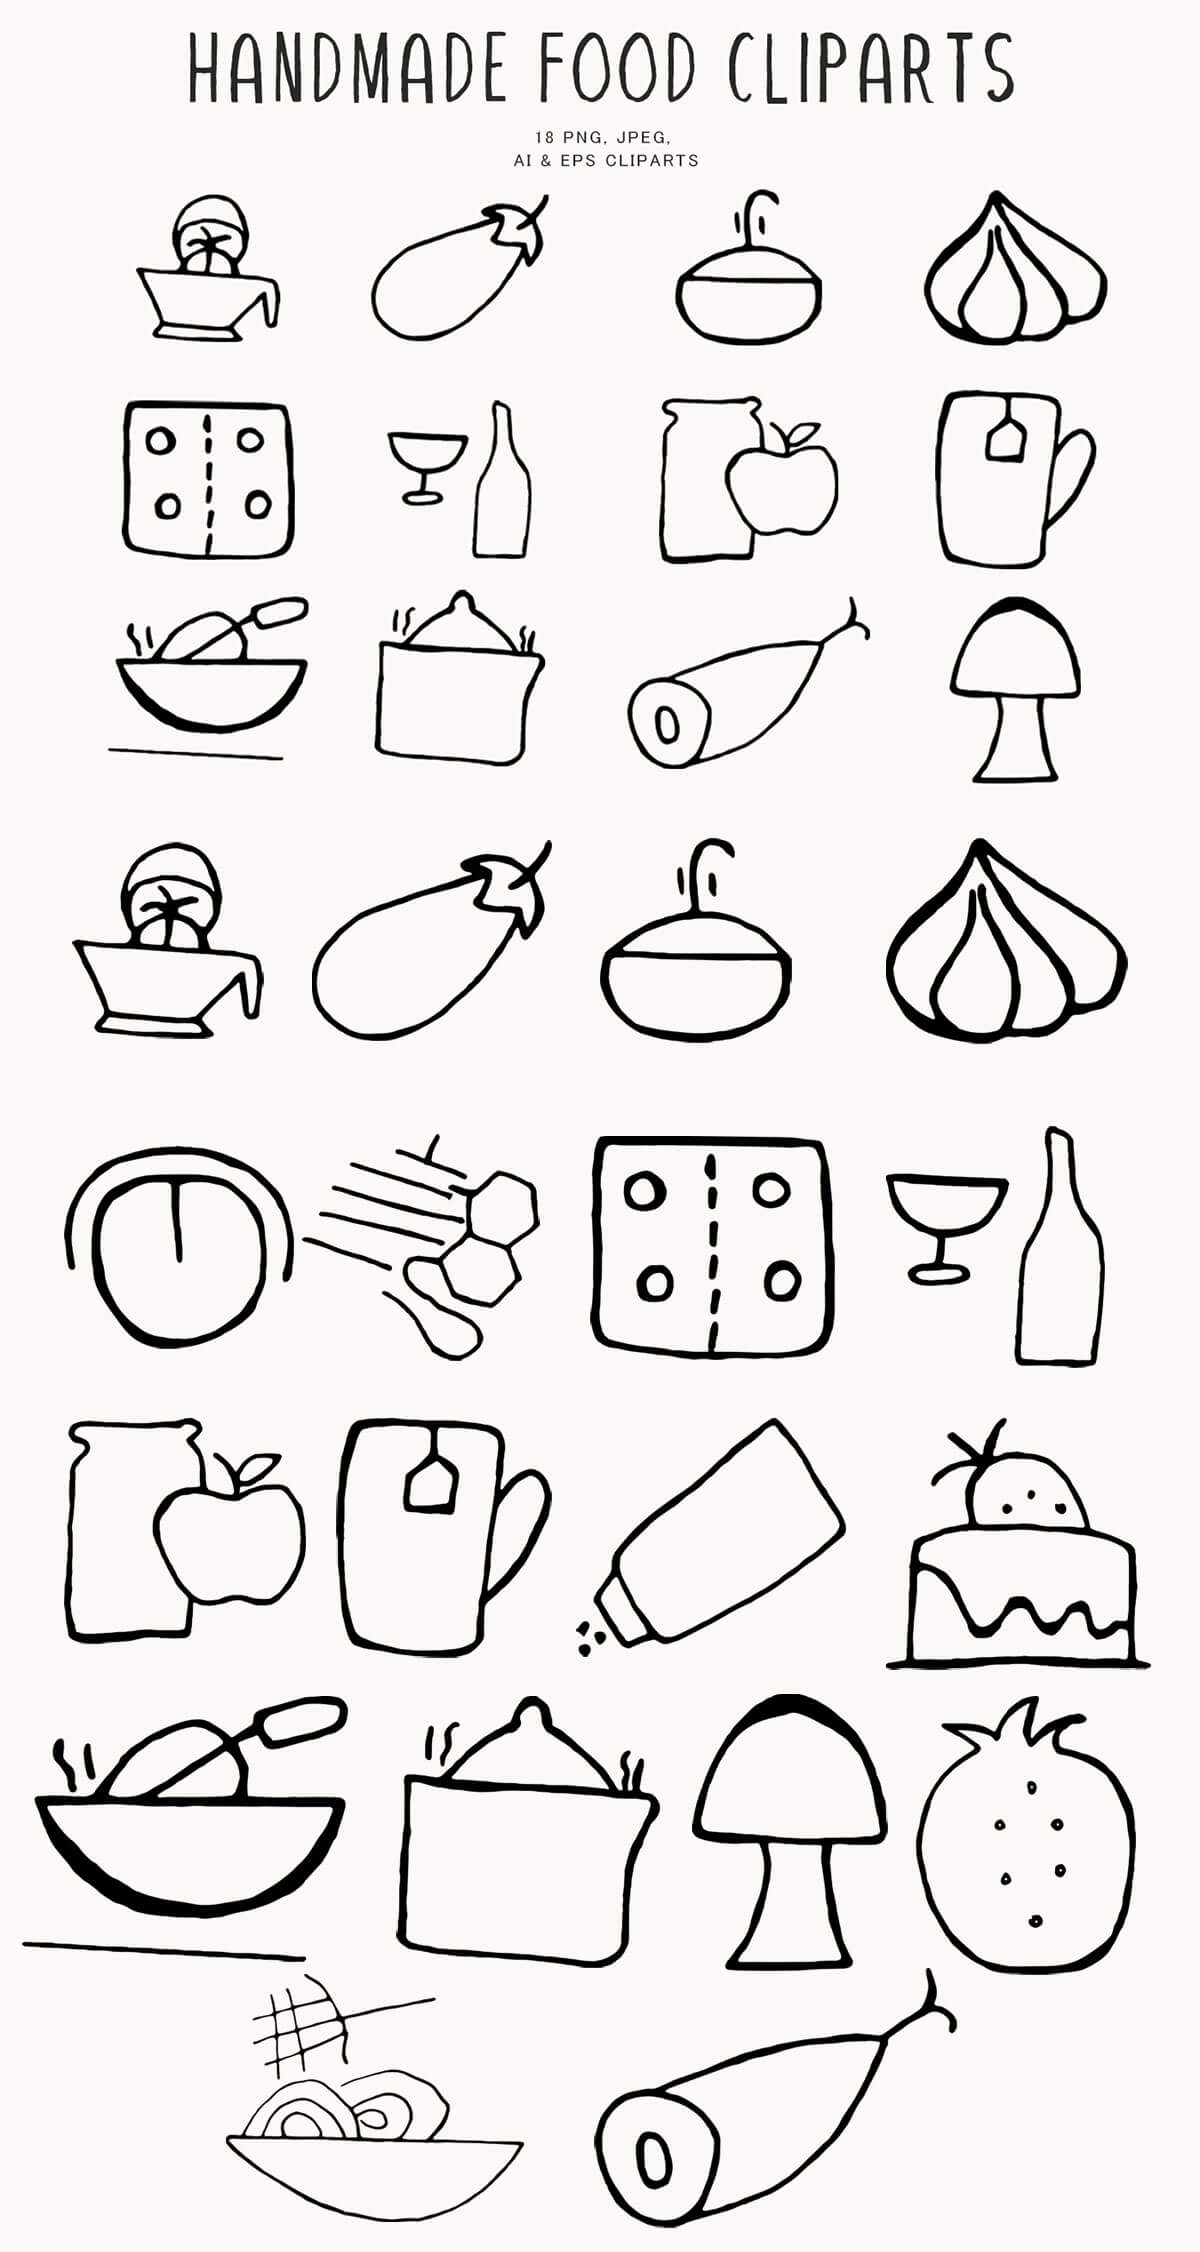 Free Handmade Food Clipart